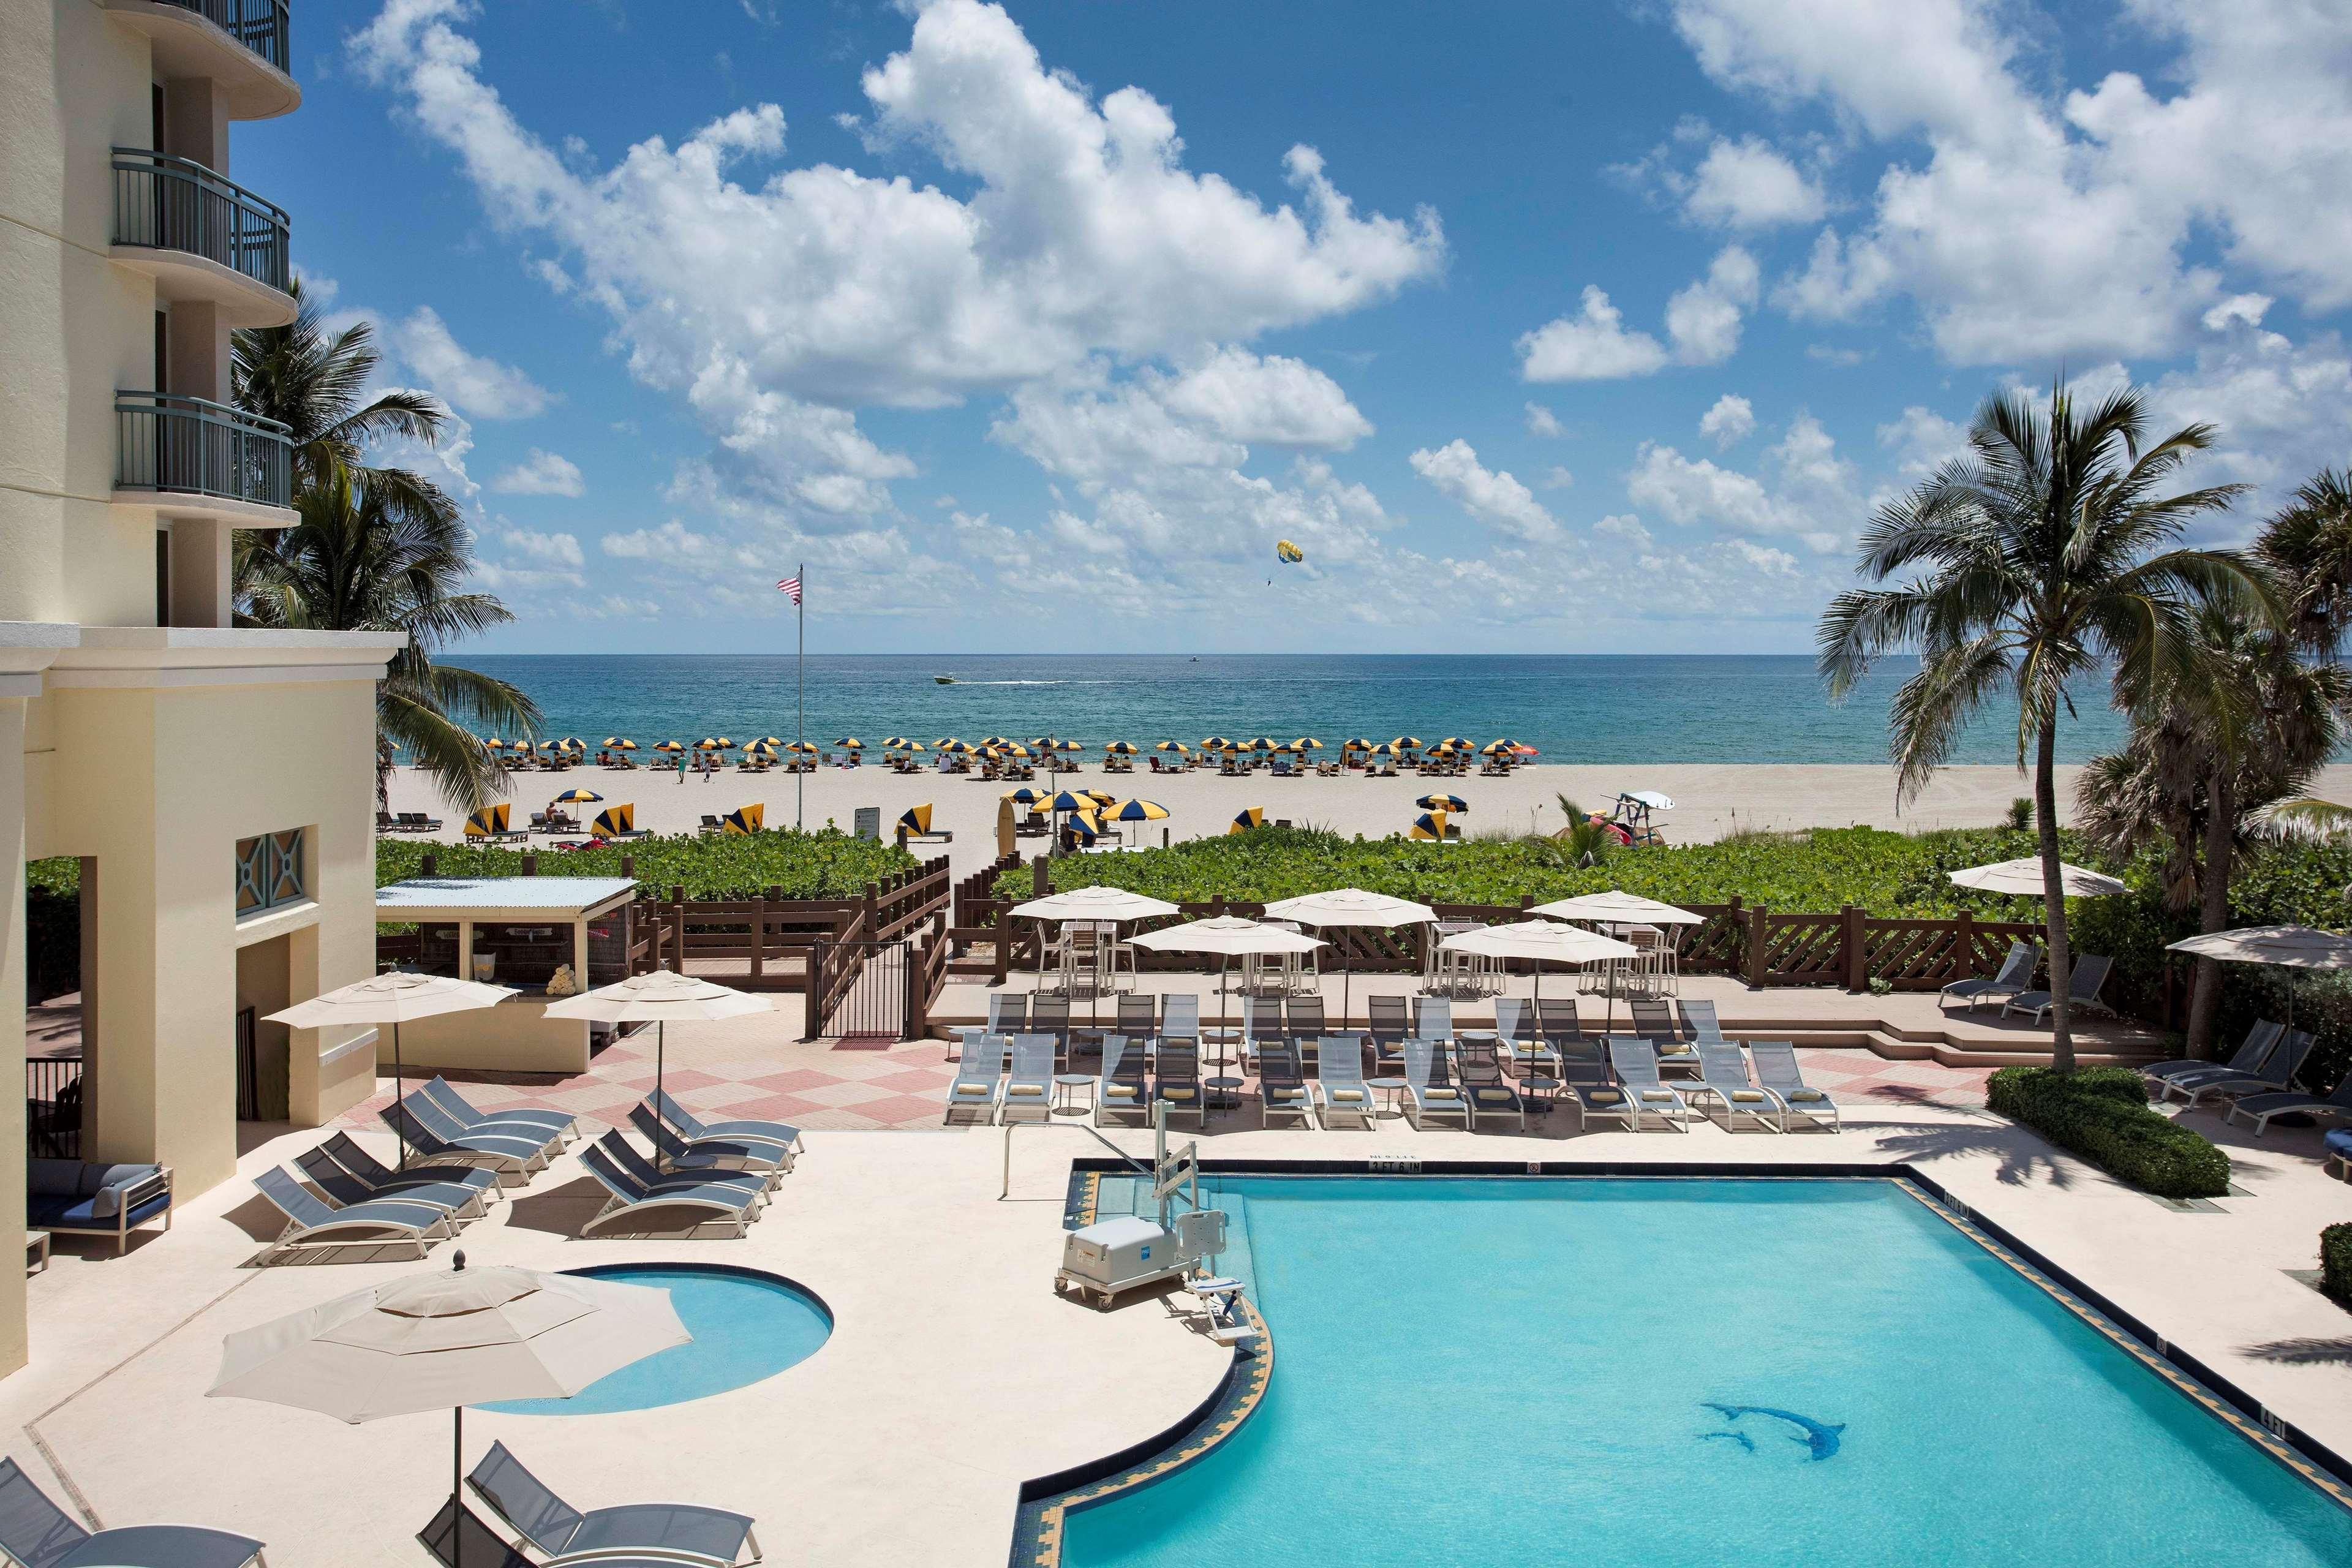 Hilton Singer Island Oceanfront/Palm Beaches Resort image 40